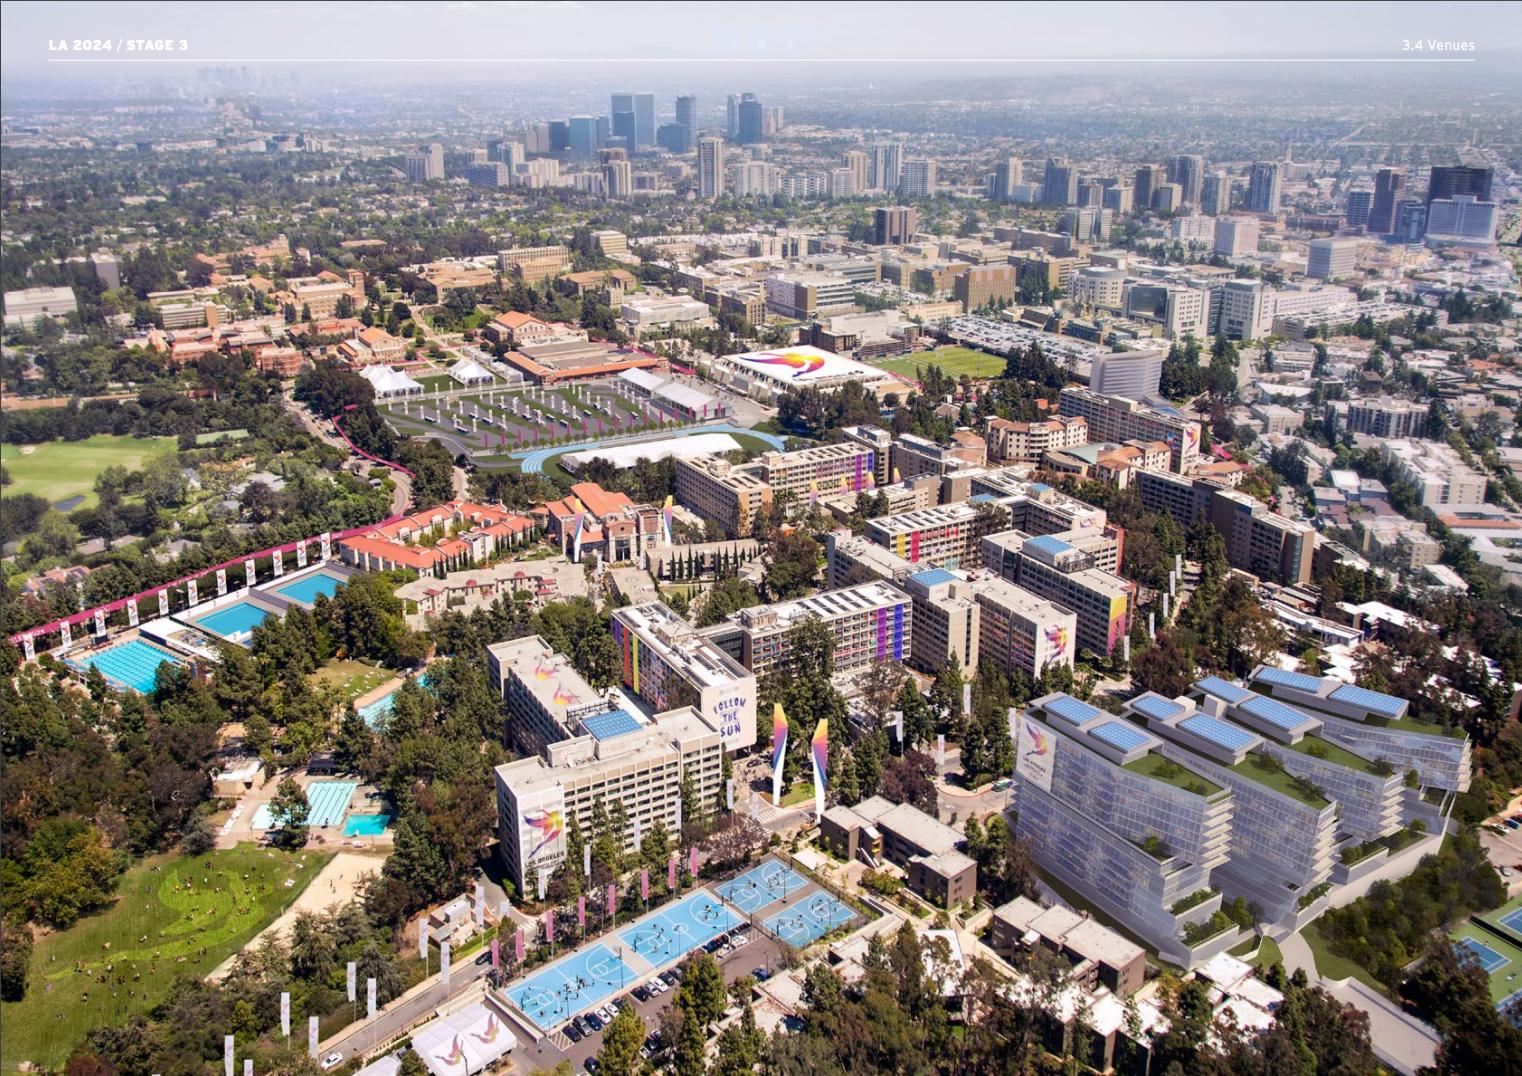 LA 2024 Olympic and Paralympic Bid Process - LA 2024 Athlete Village Rendering